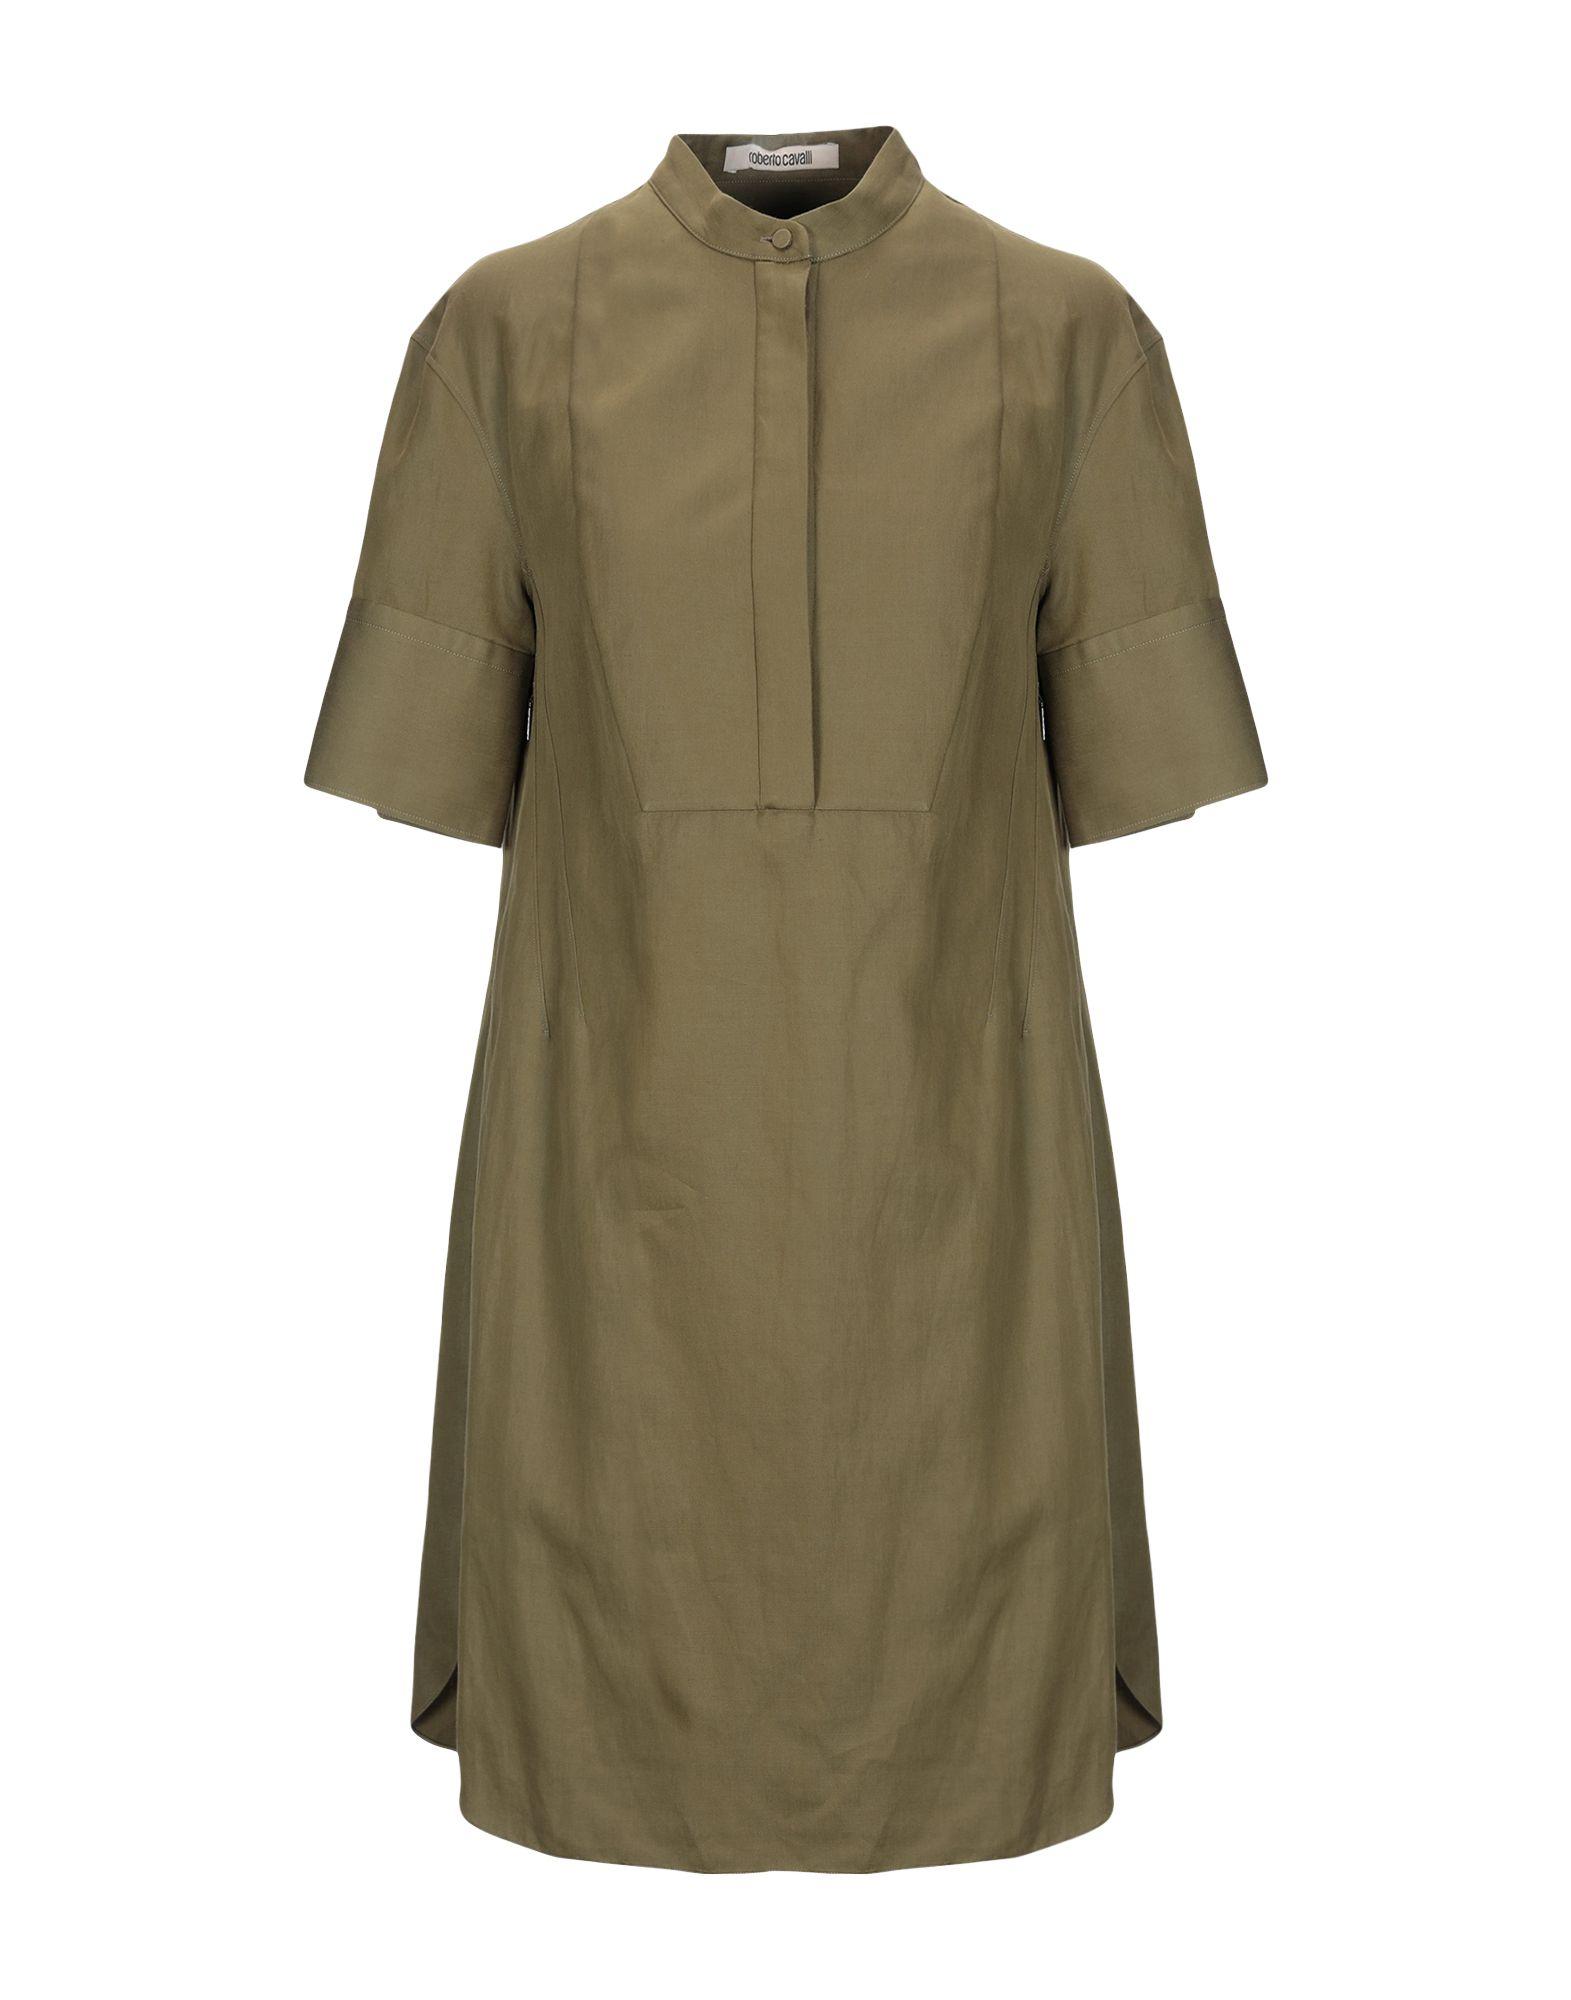 ROBERTO CAVALLI Короткое платье платье рубашка fox yulia sway платье рубашка fox